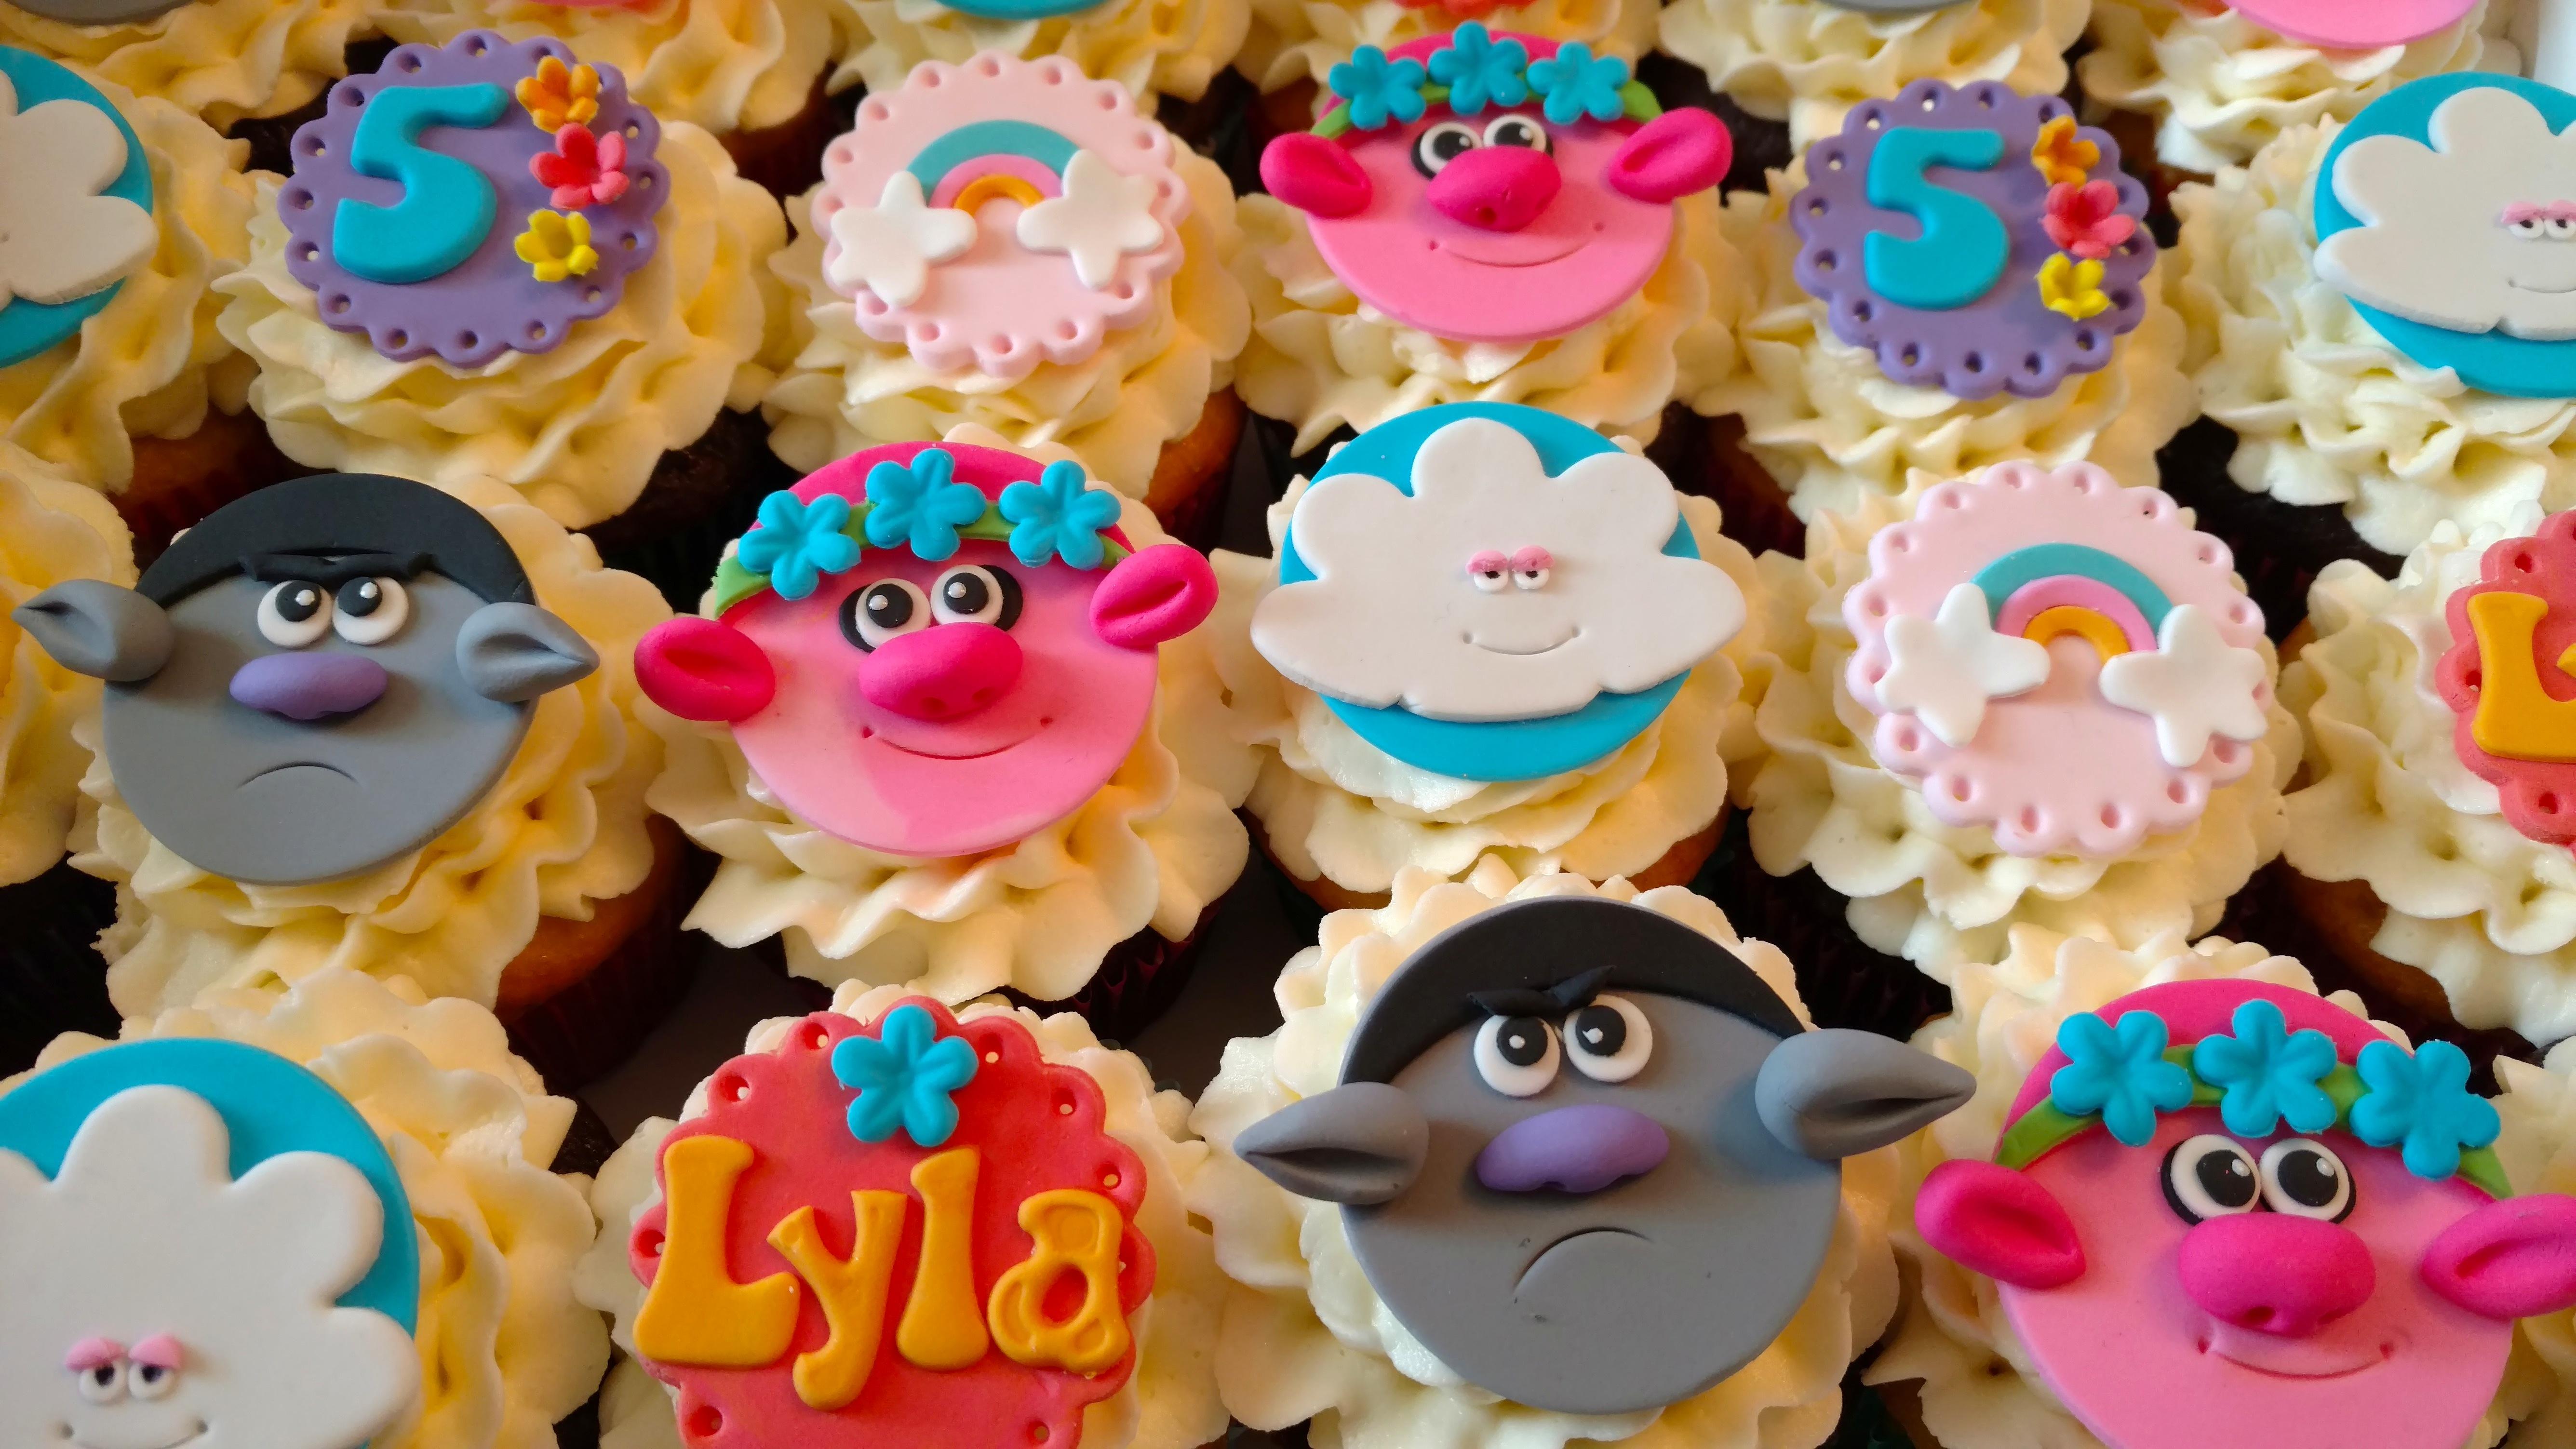 Lyla's Troll's Cupcakes